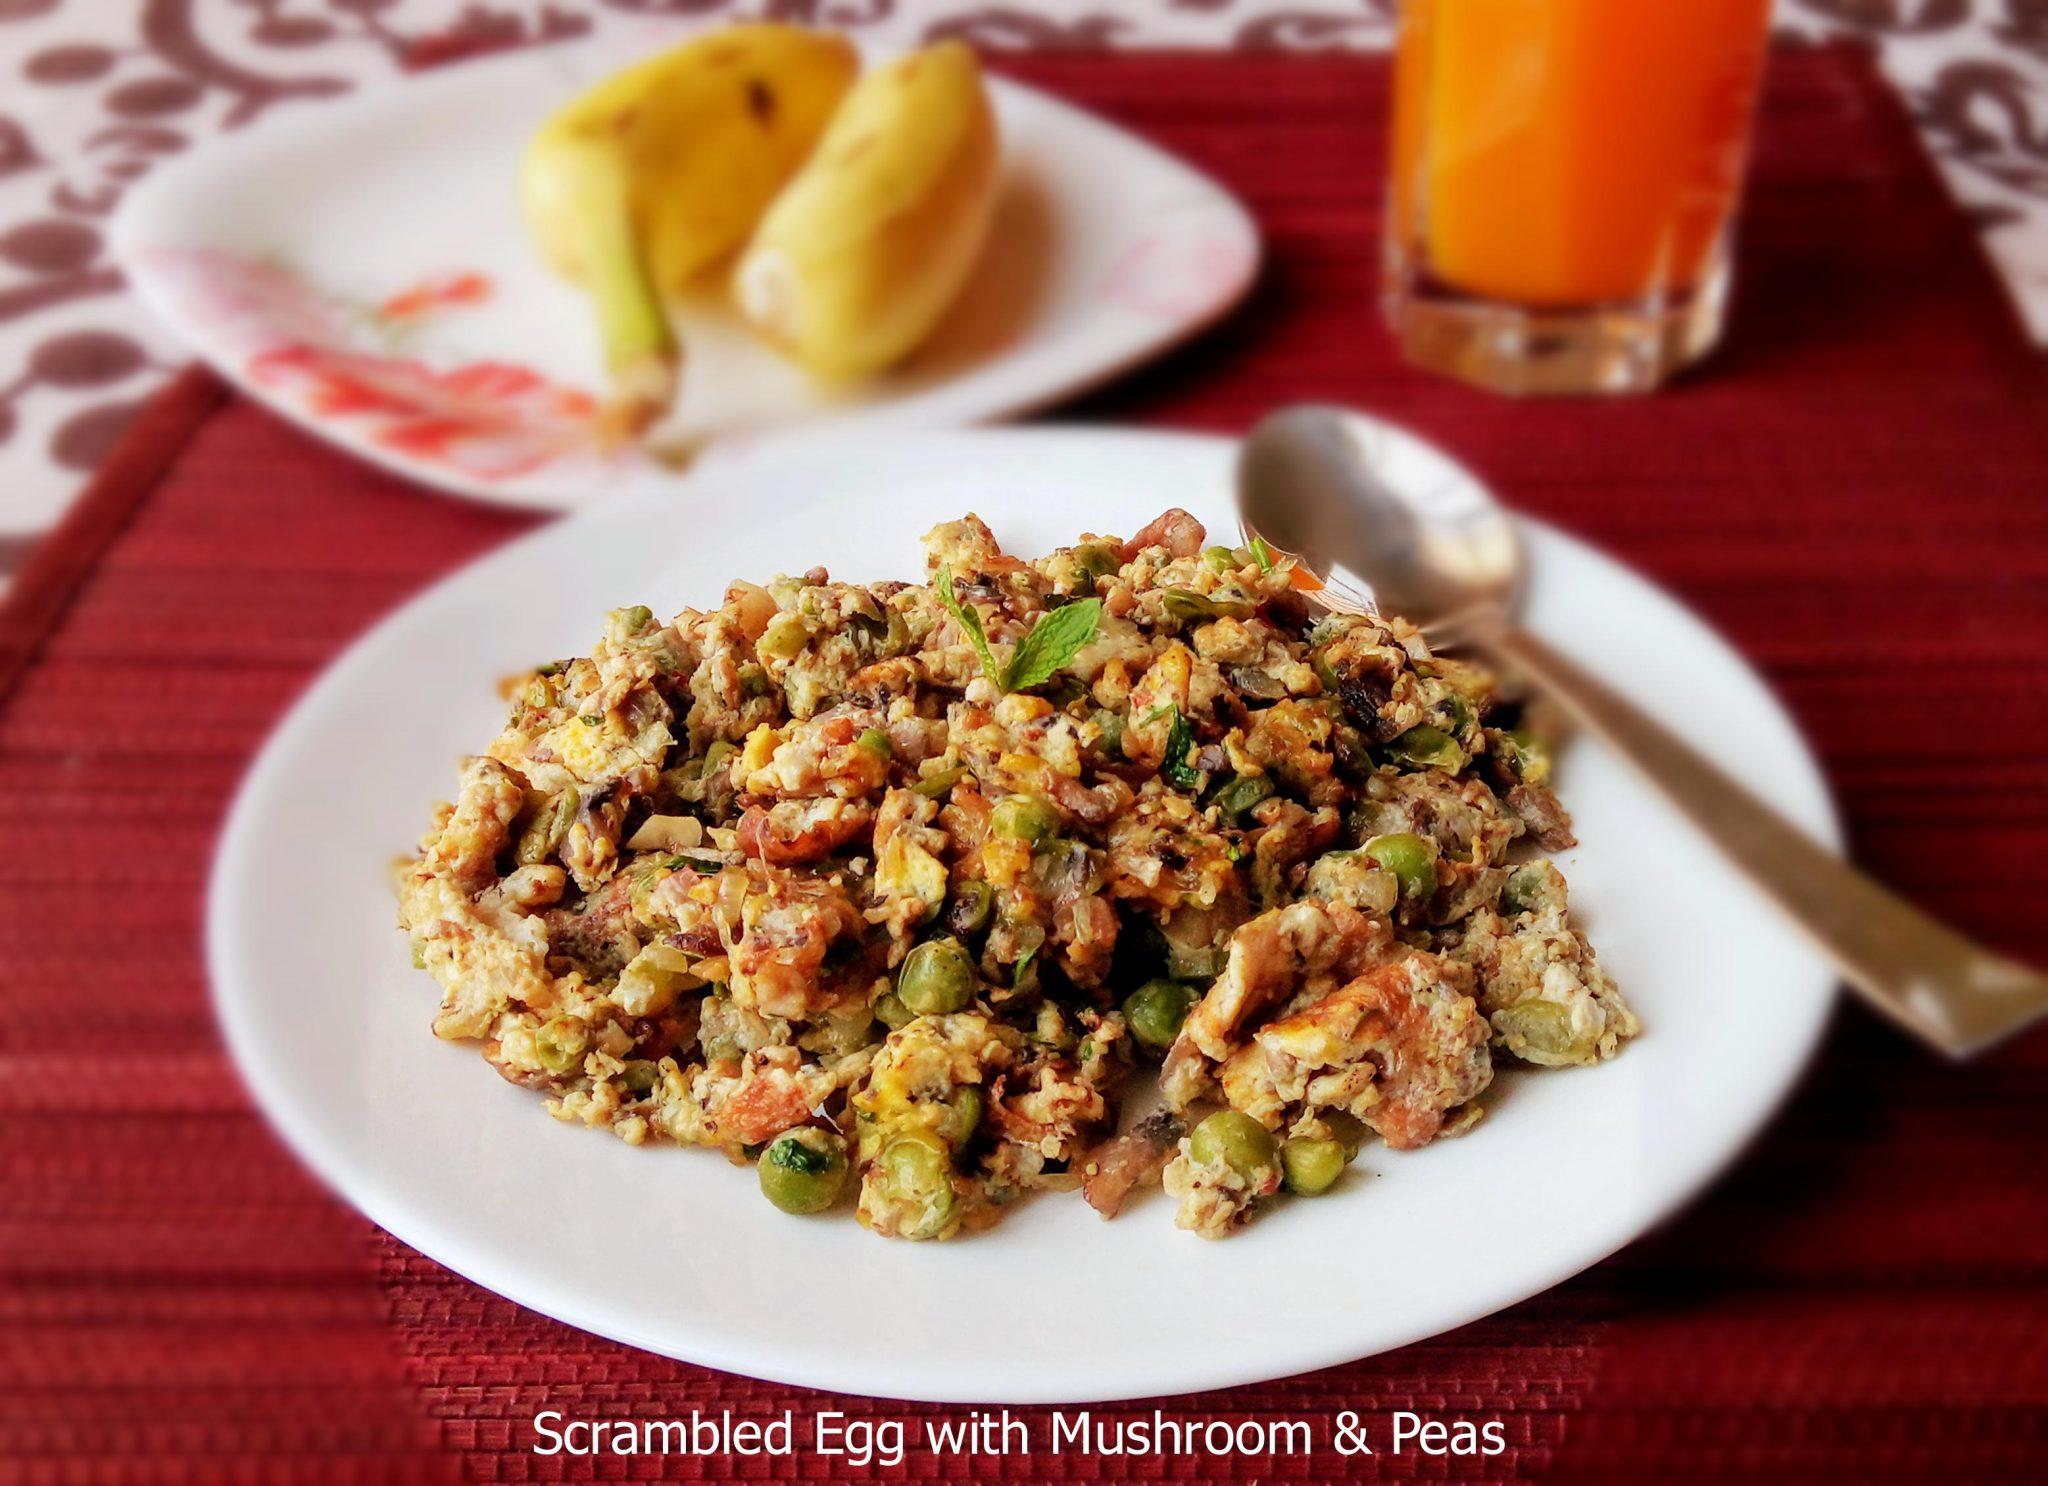 Scrambled Eggs with Mushroom